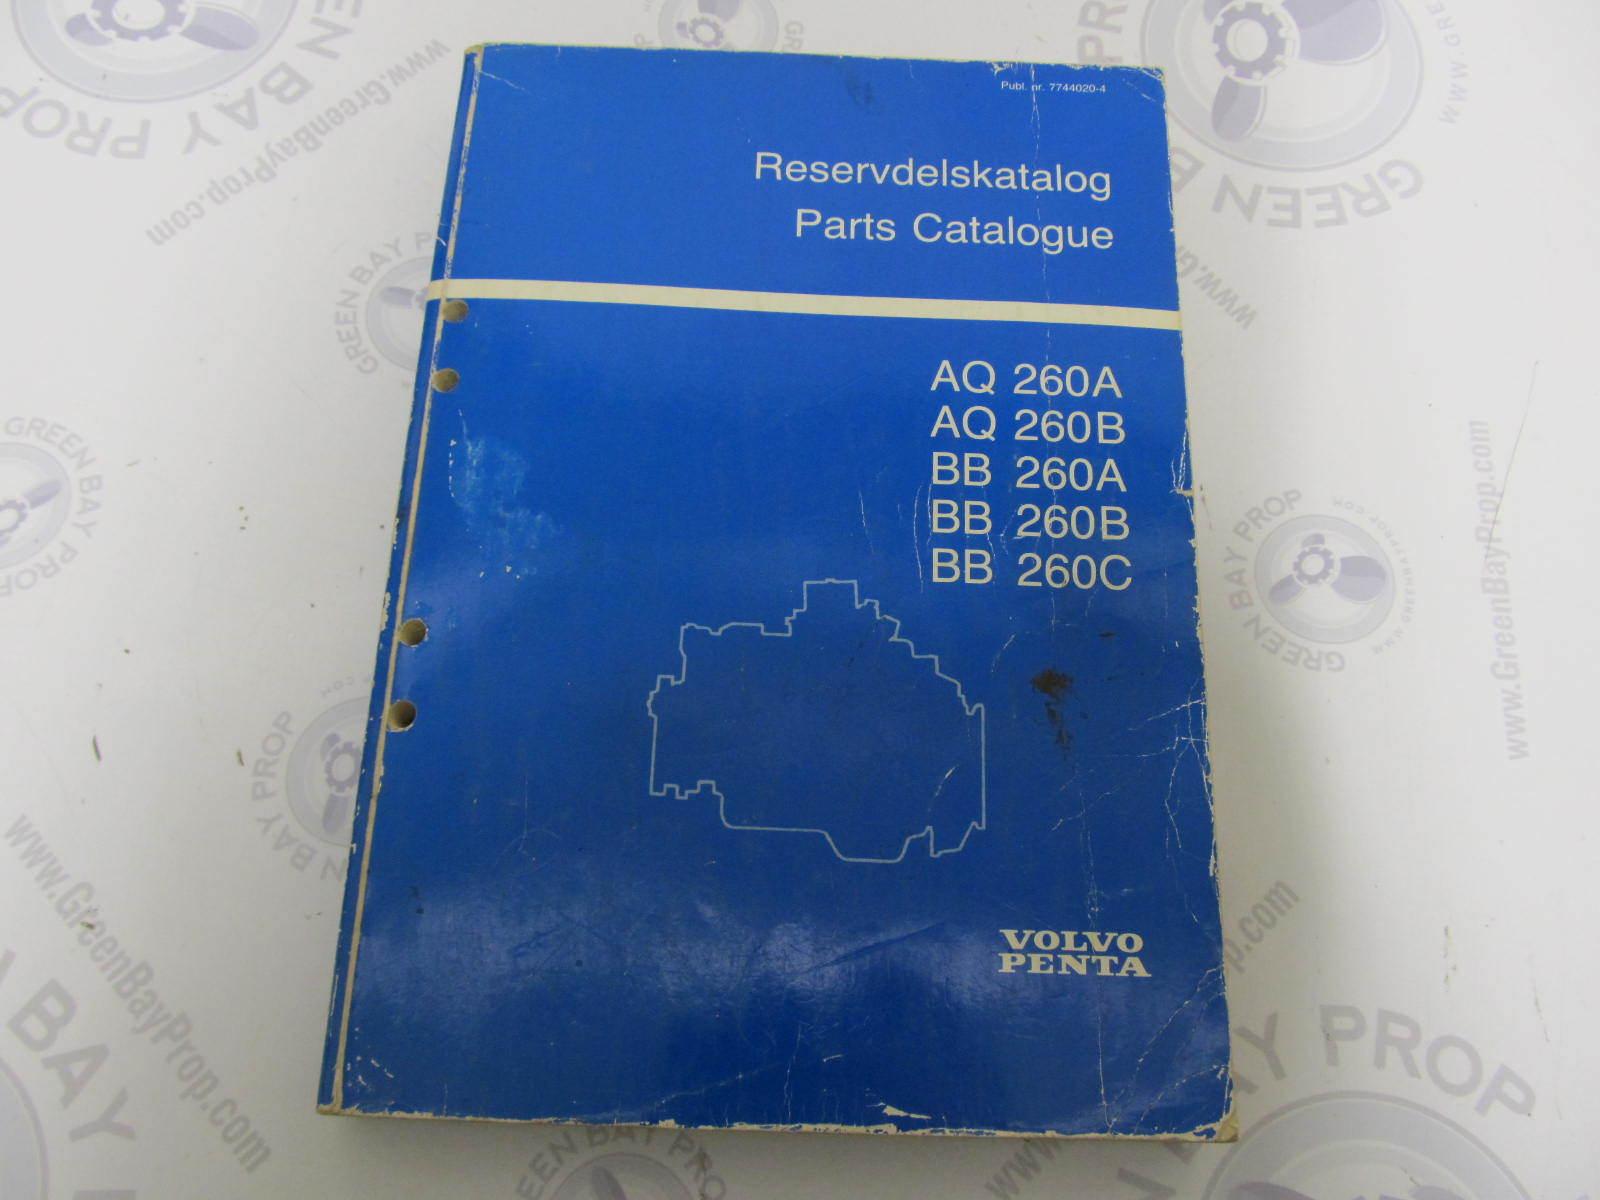 hight resolution of 7744020 4 volvo penta stern drive parts catalog aq260a b bb260a b b green bay propeller marine llc